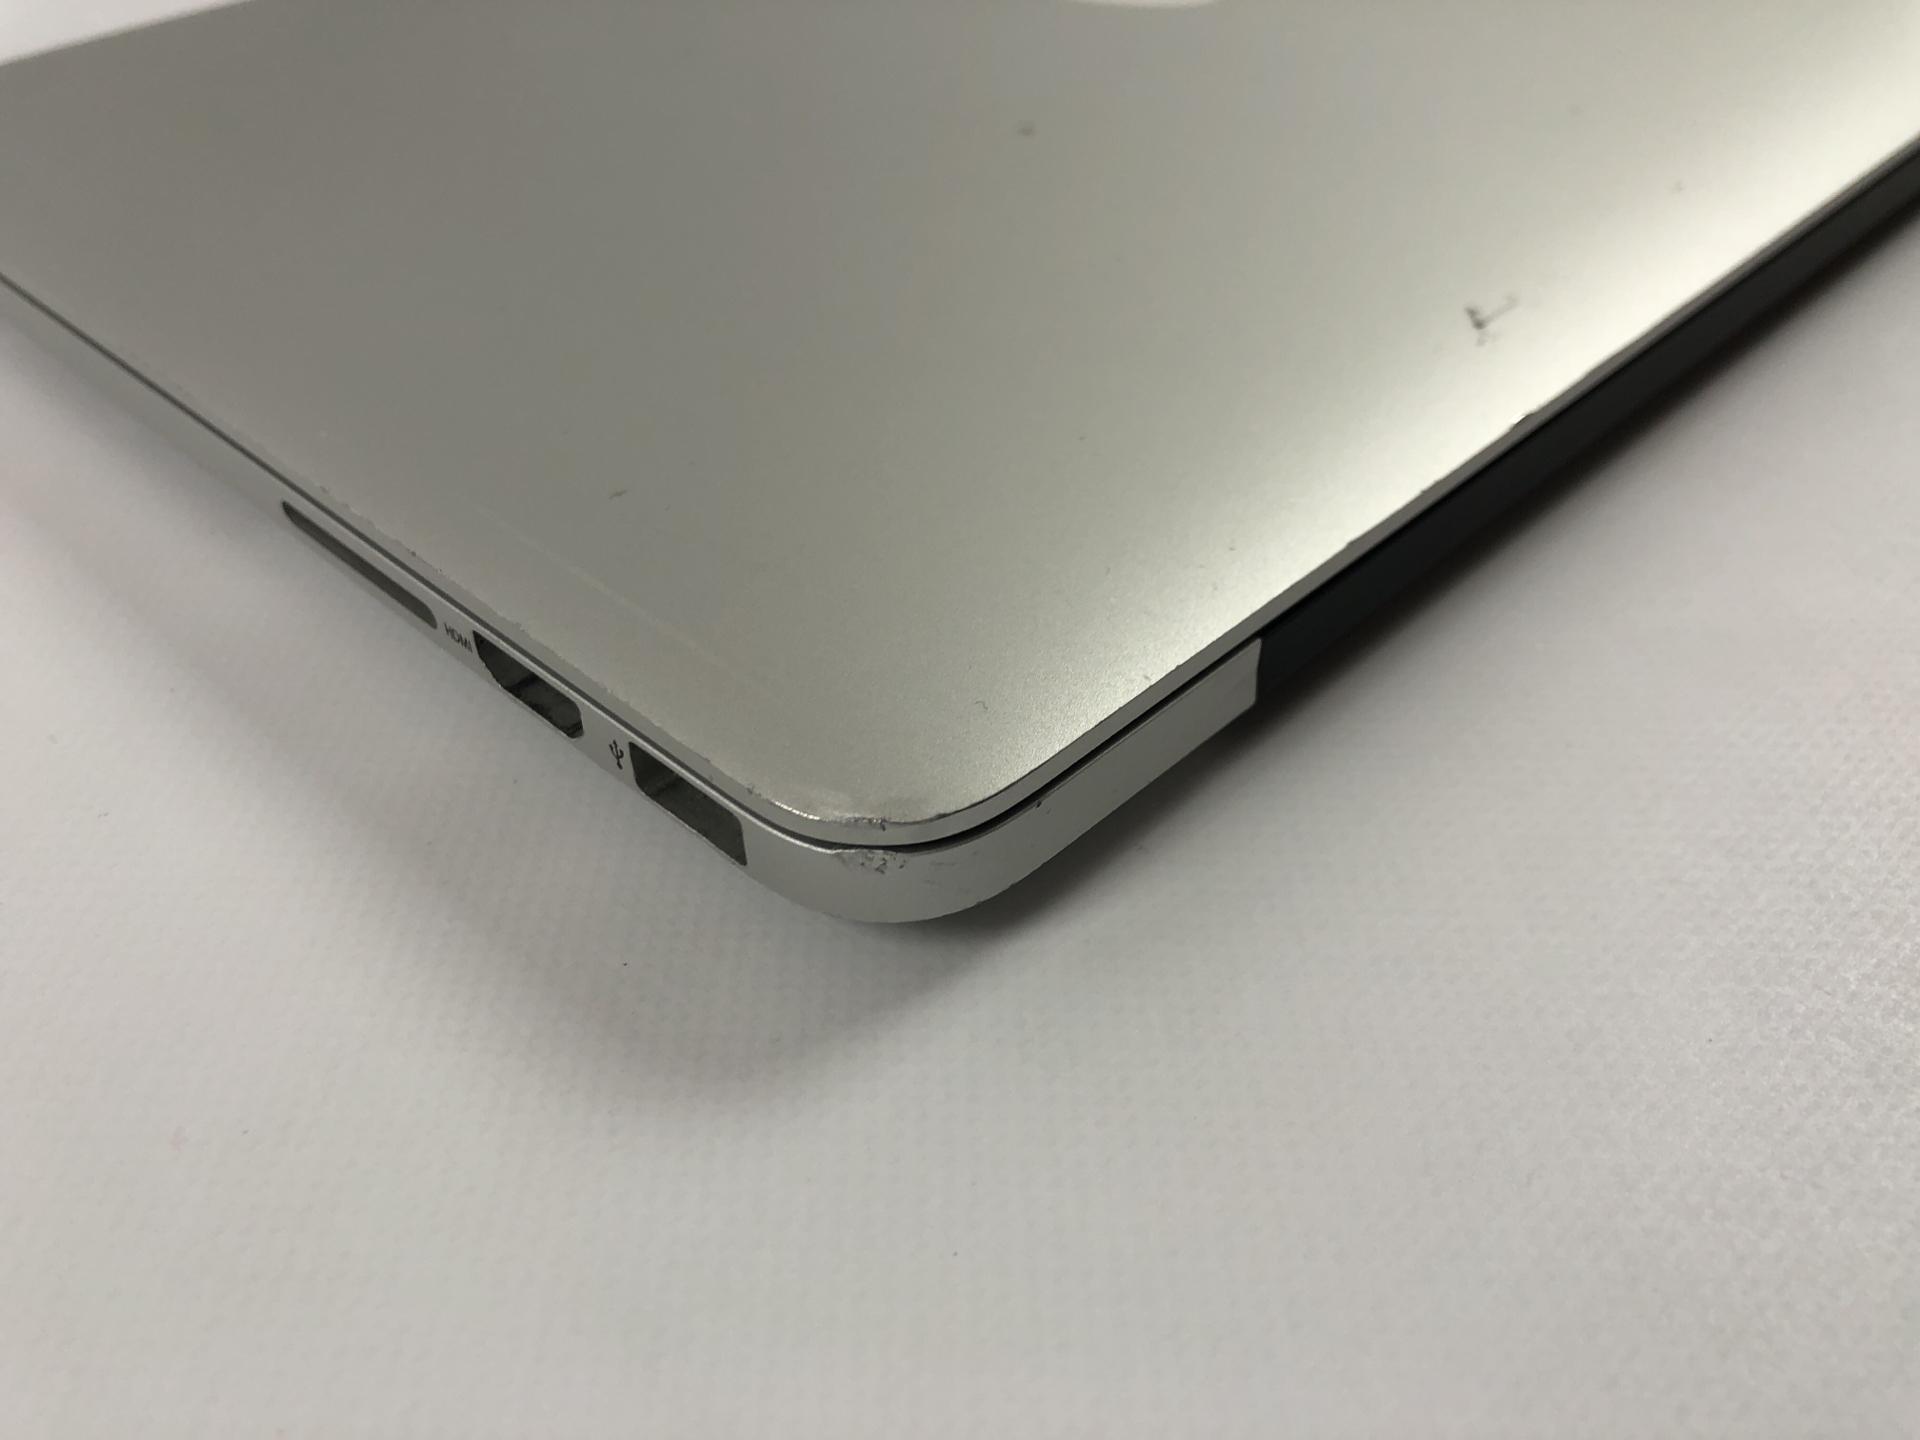 "MacBook Pro Retina 13"" Early 2015 (Intel Core i7 3.1 GHz 16 GB RAM 512 GB SSD), Intel Core i7 3.1 GHz, 16 GB RAM, 512 GB SSD, Bild 4"